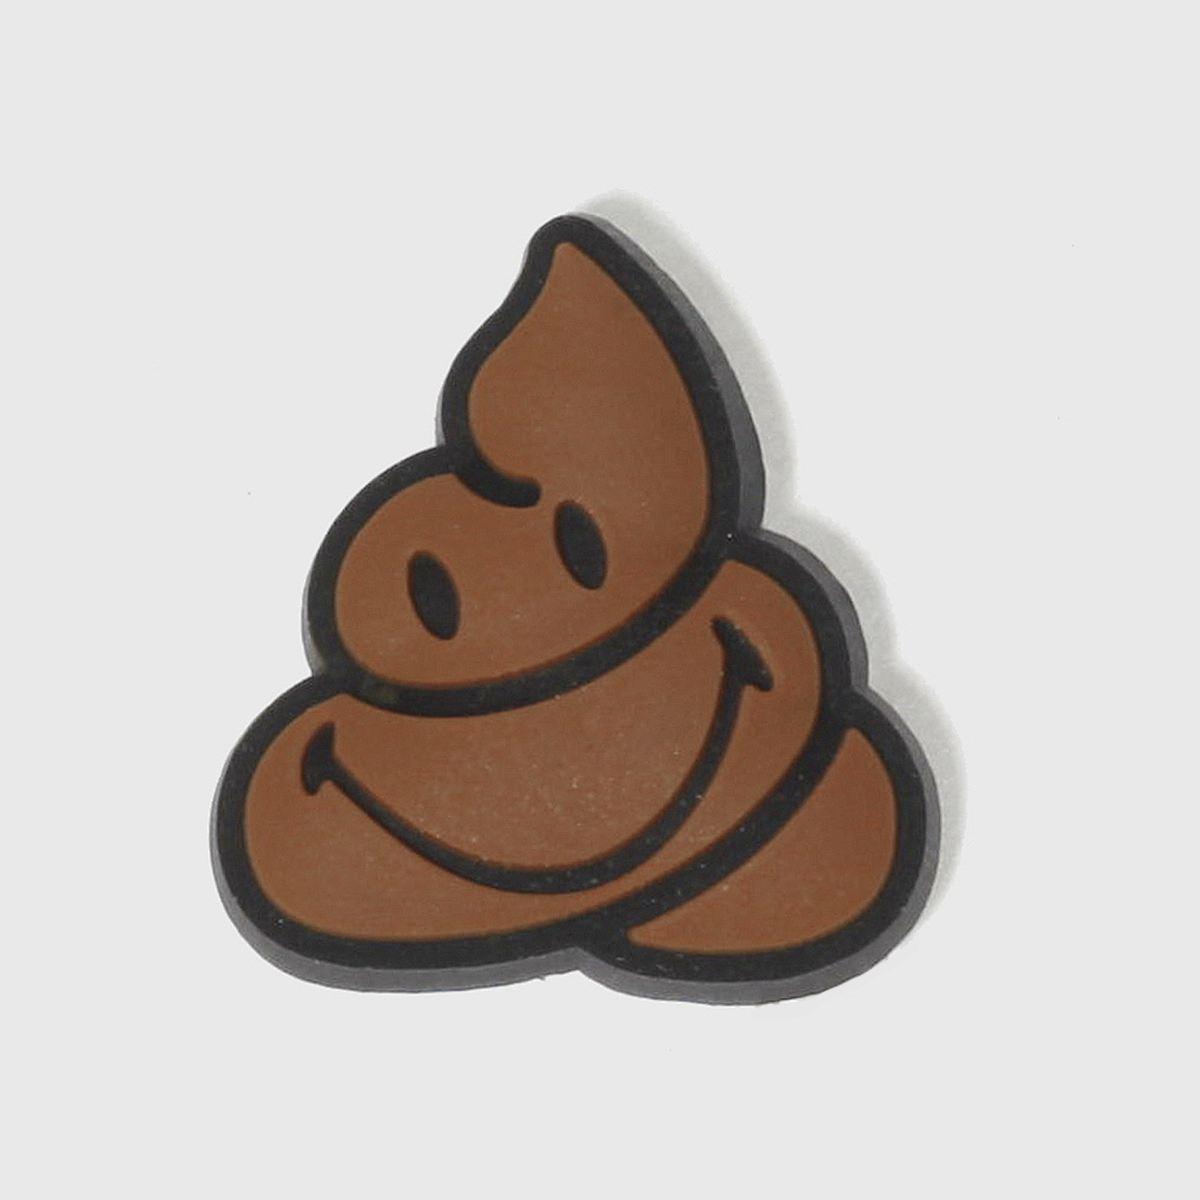 jibbitz Jibbitz Brown Smiley Chocolate Face